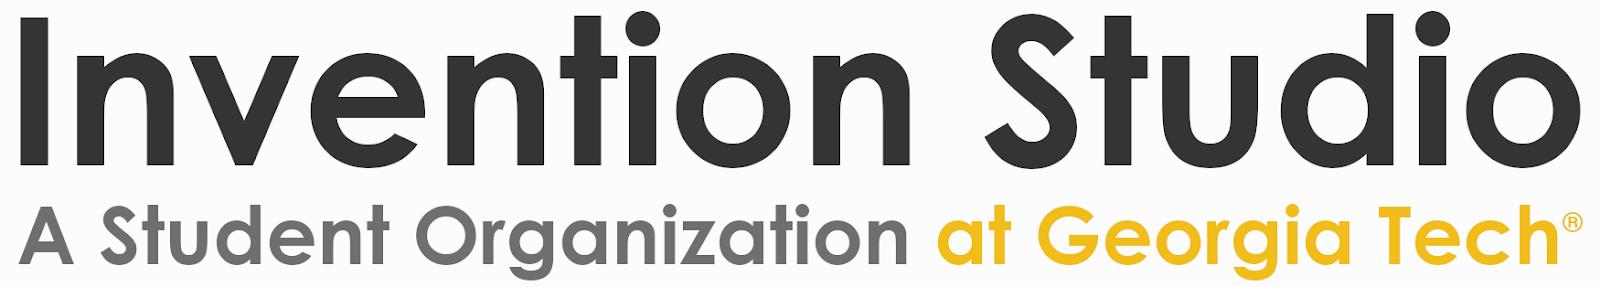 Invention Studio @ Georgia Tech Logo